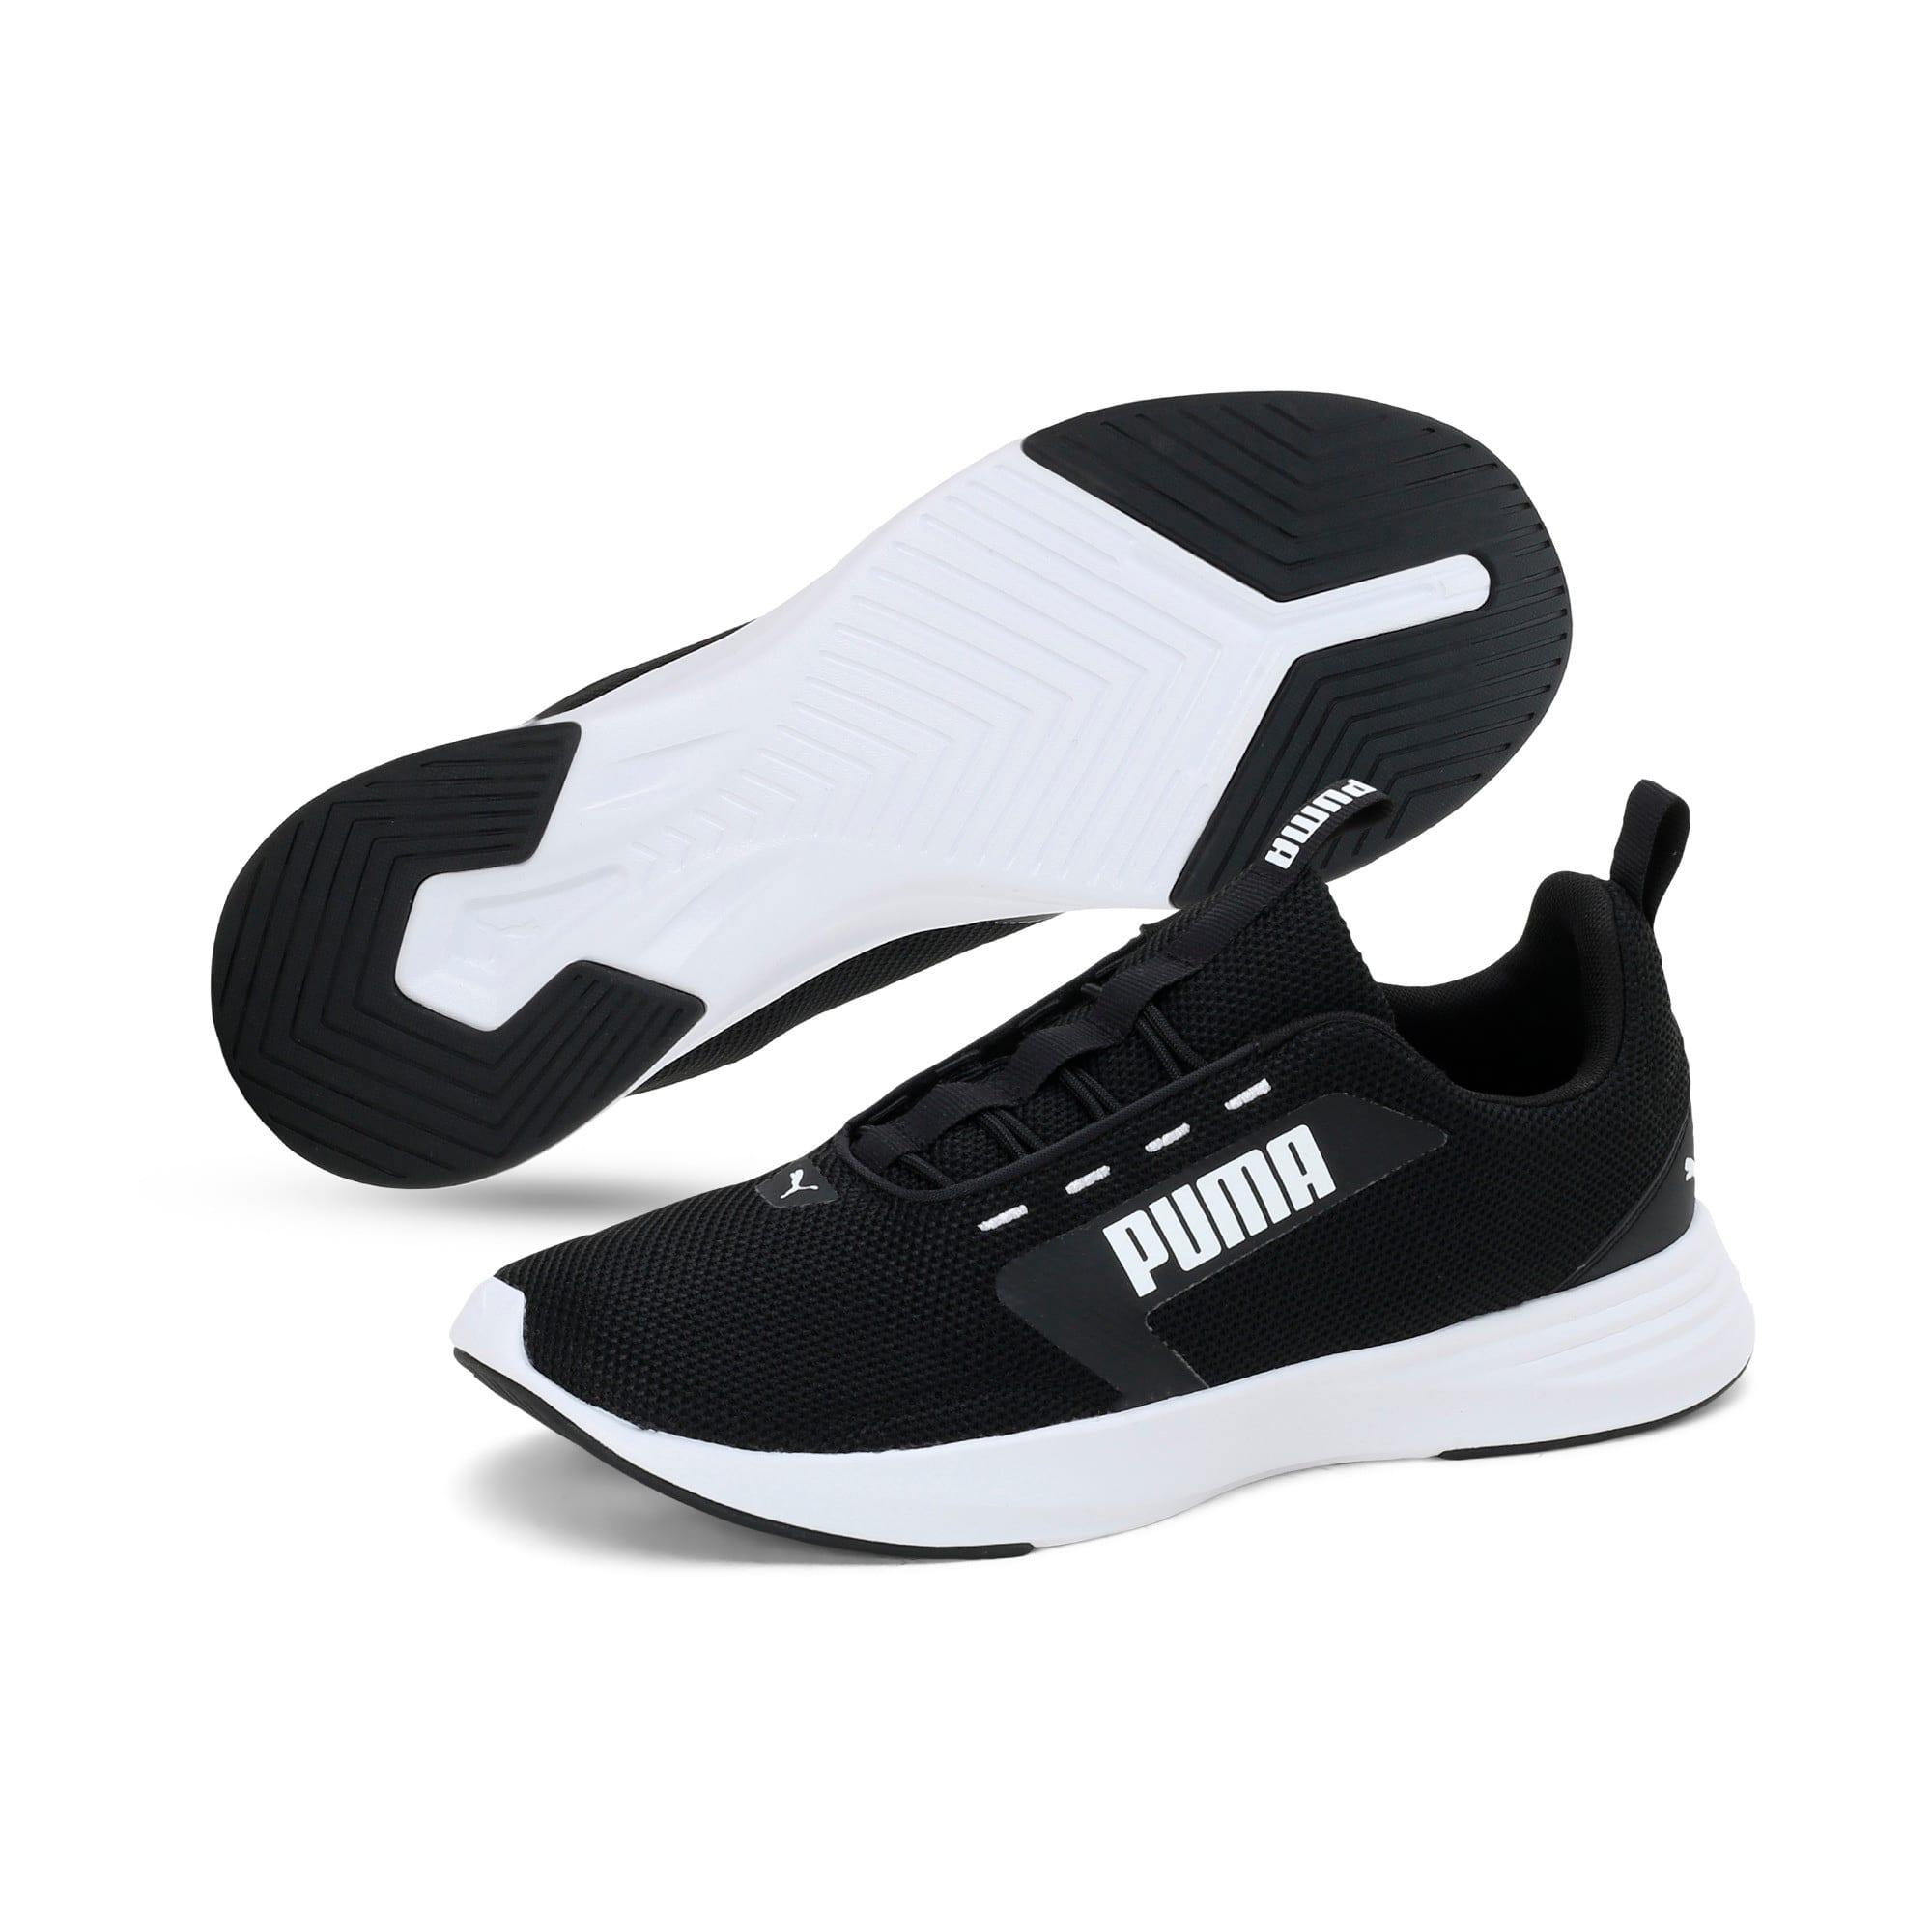 Thumbnail 2 of Extractor Running Shoes, Puma Black-Puma White, medium-IND